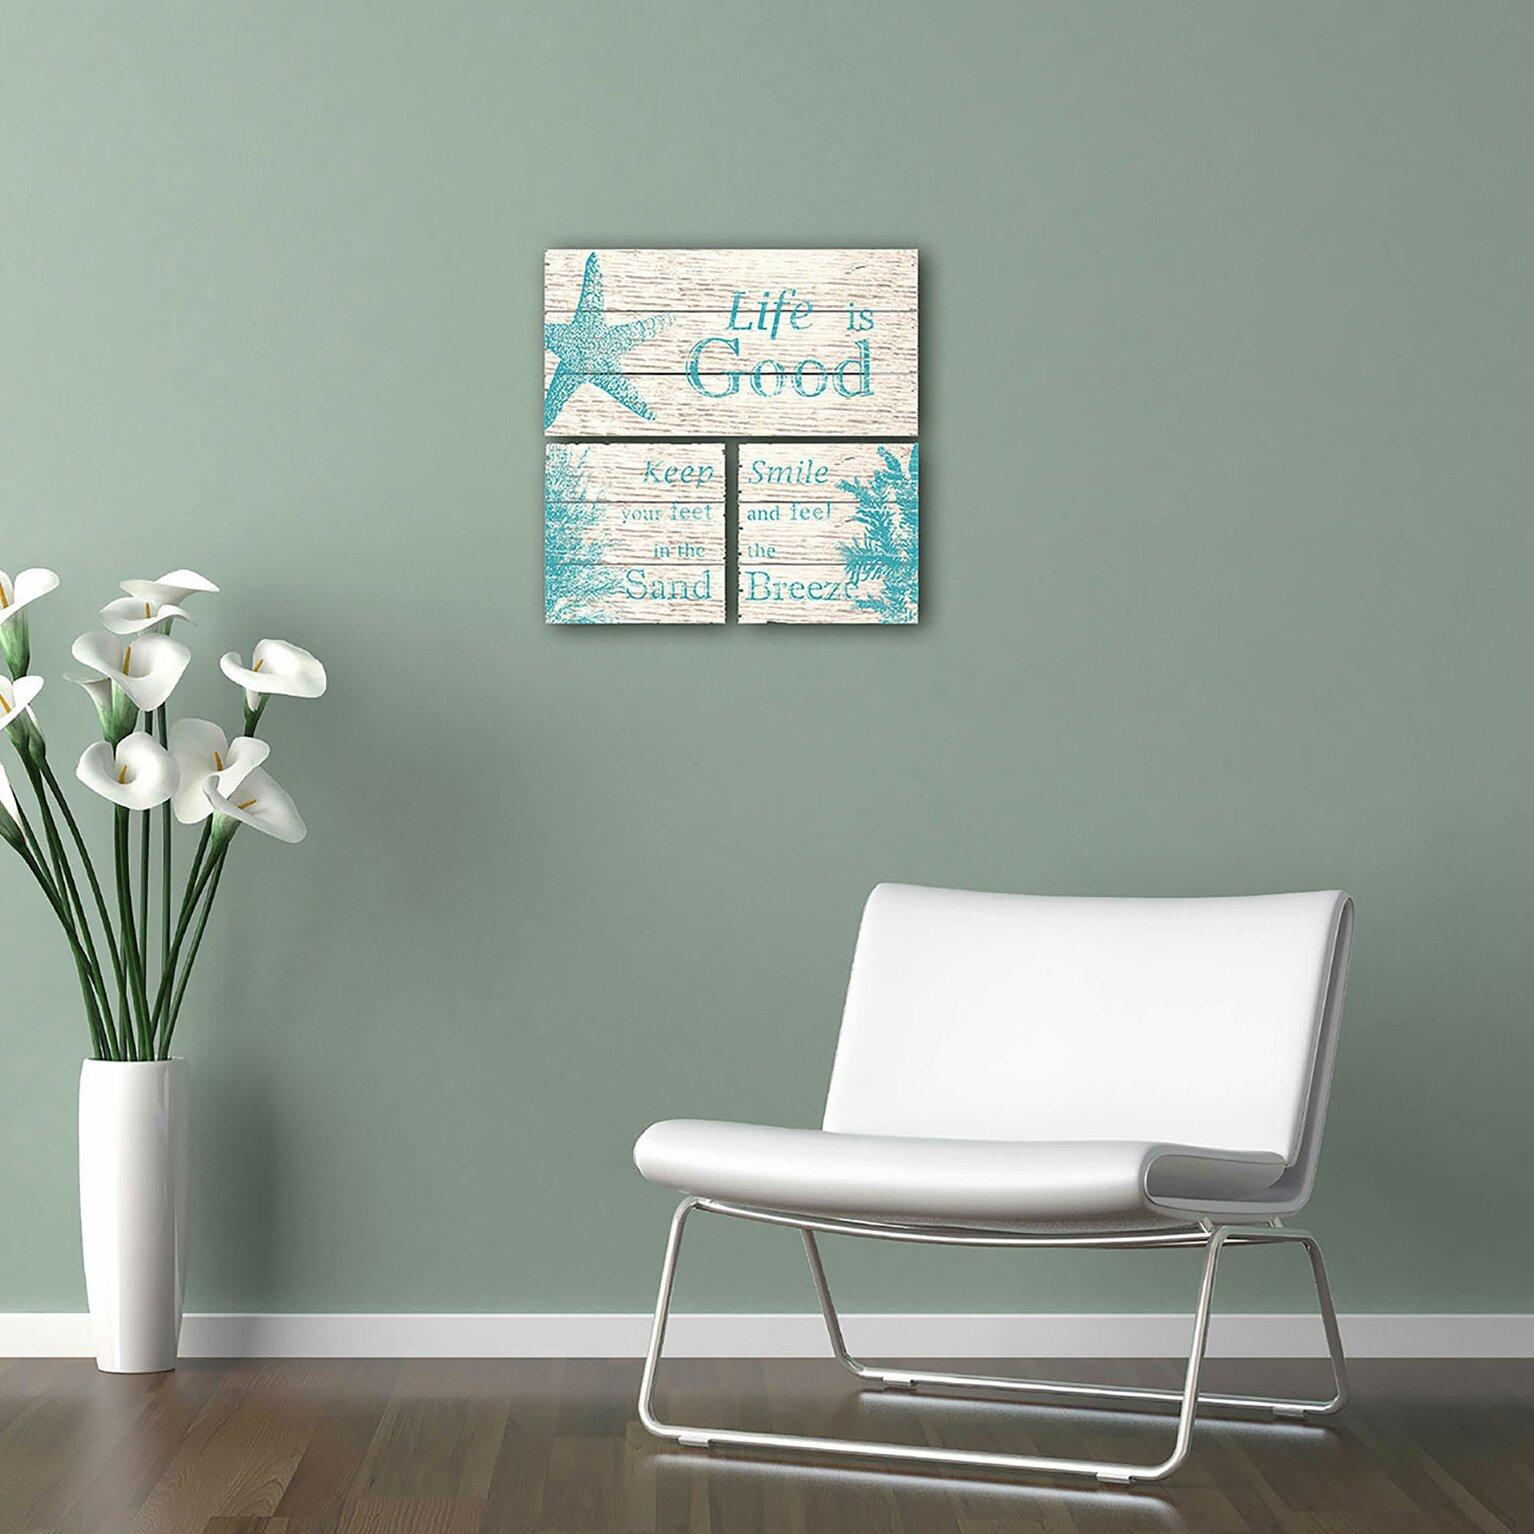 ptm images life is good 3 piece wall decor set reviews. Black Bedroom Furniture Sets. Home Design Ideas